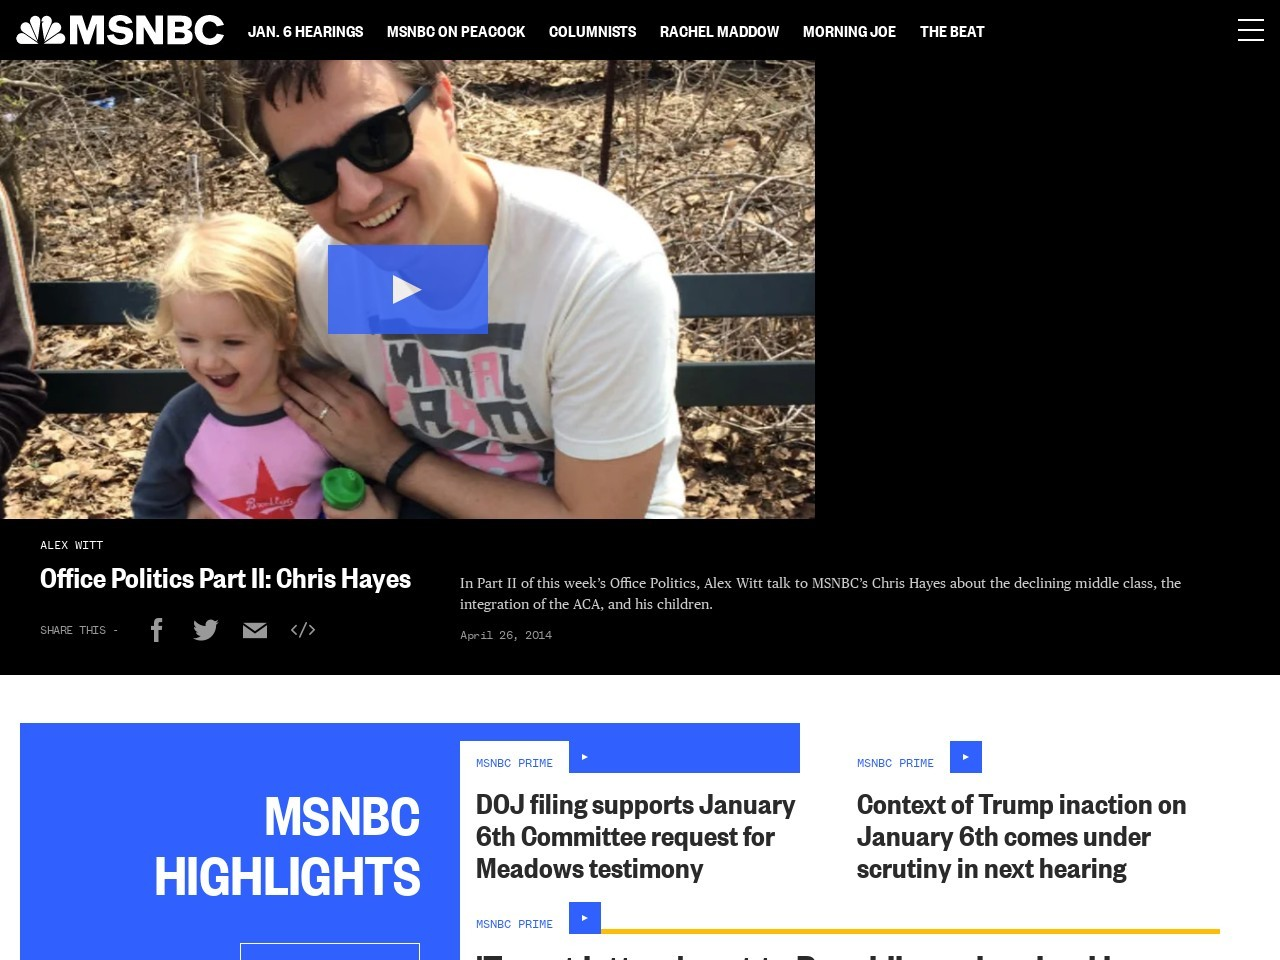 Office Politics Part II: Chris Hayes | MSNBC